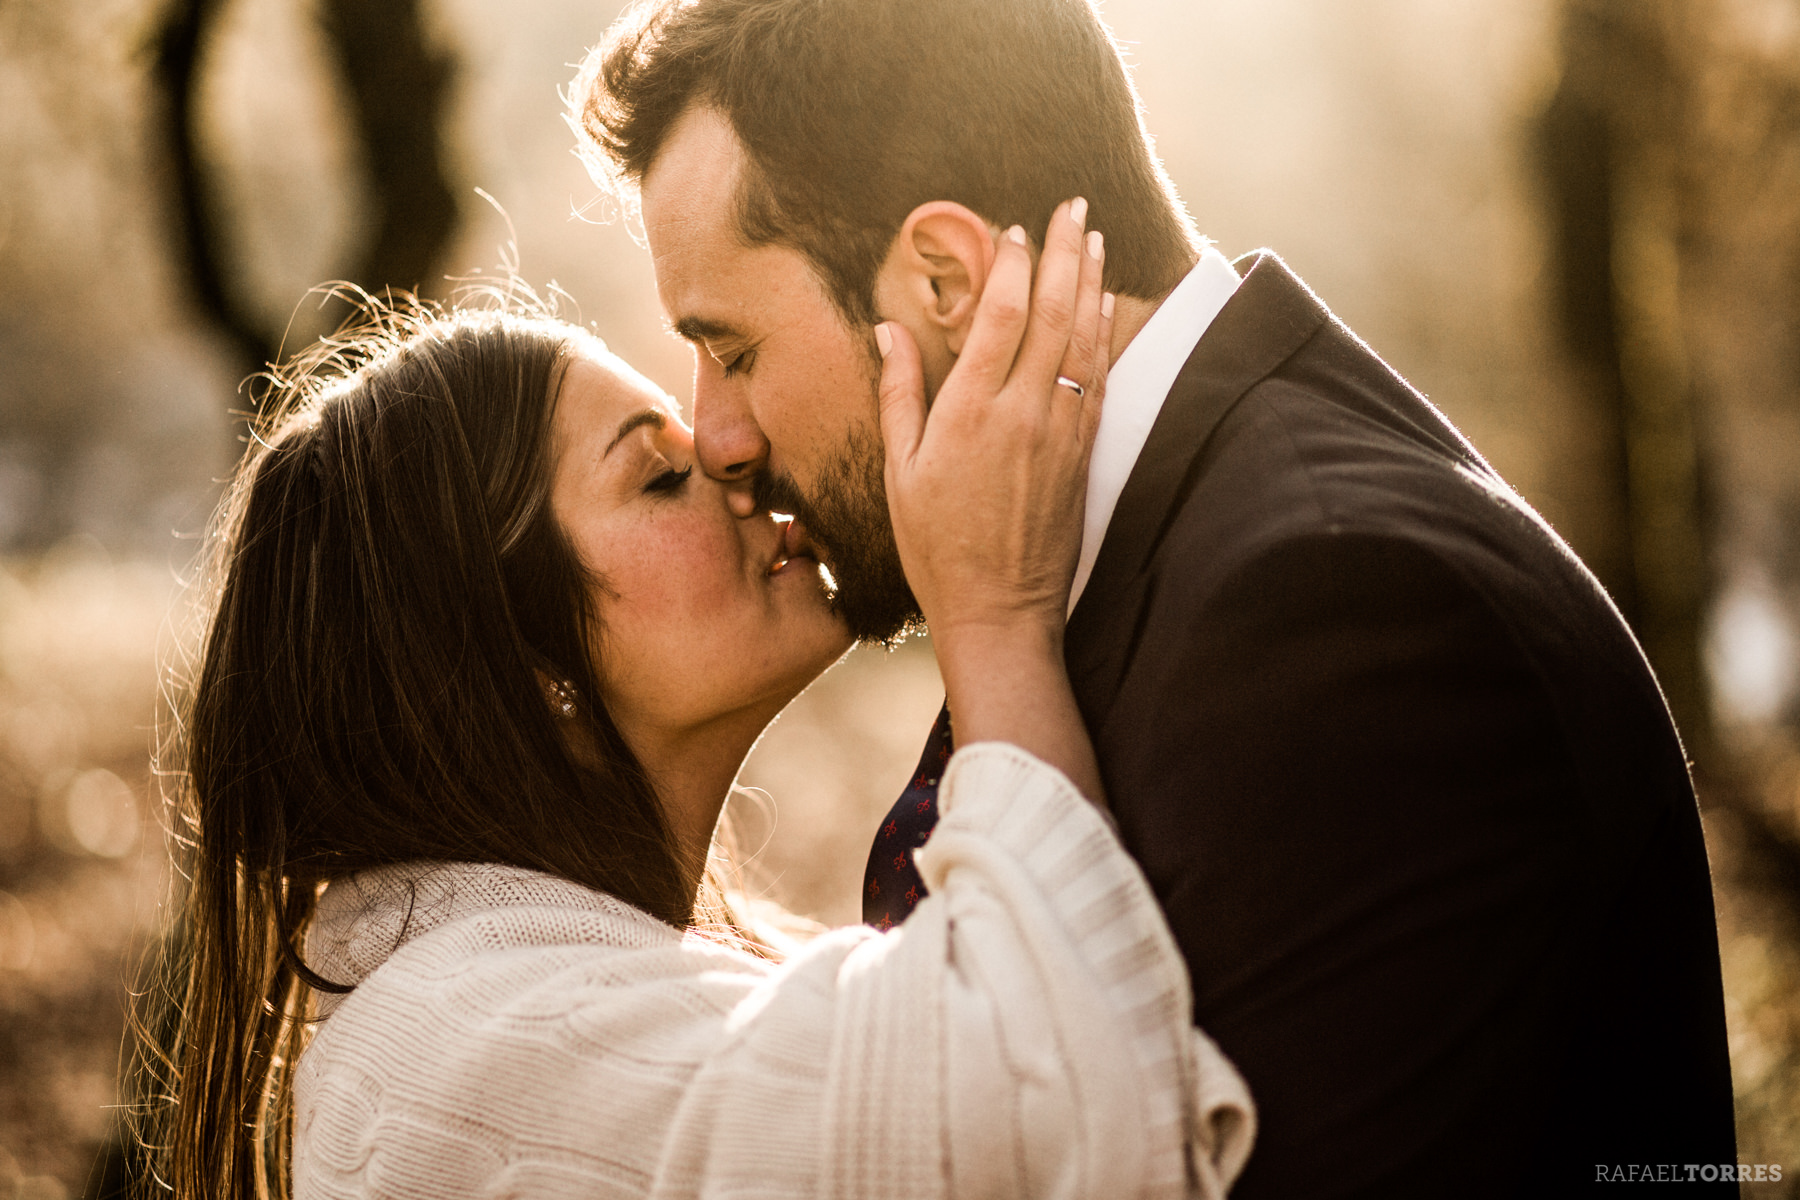 bea-juan-carmona-fotografo-boda-en-sevilla-rafael-torres-photo-74.jpg